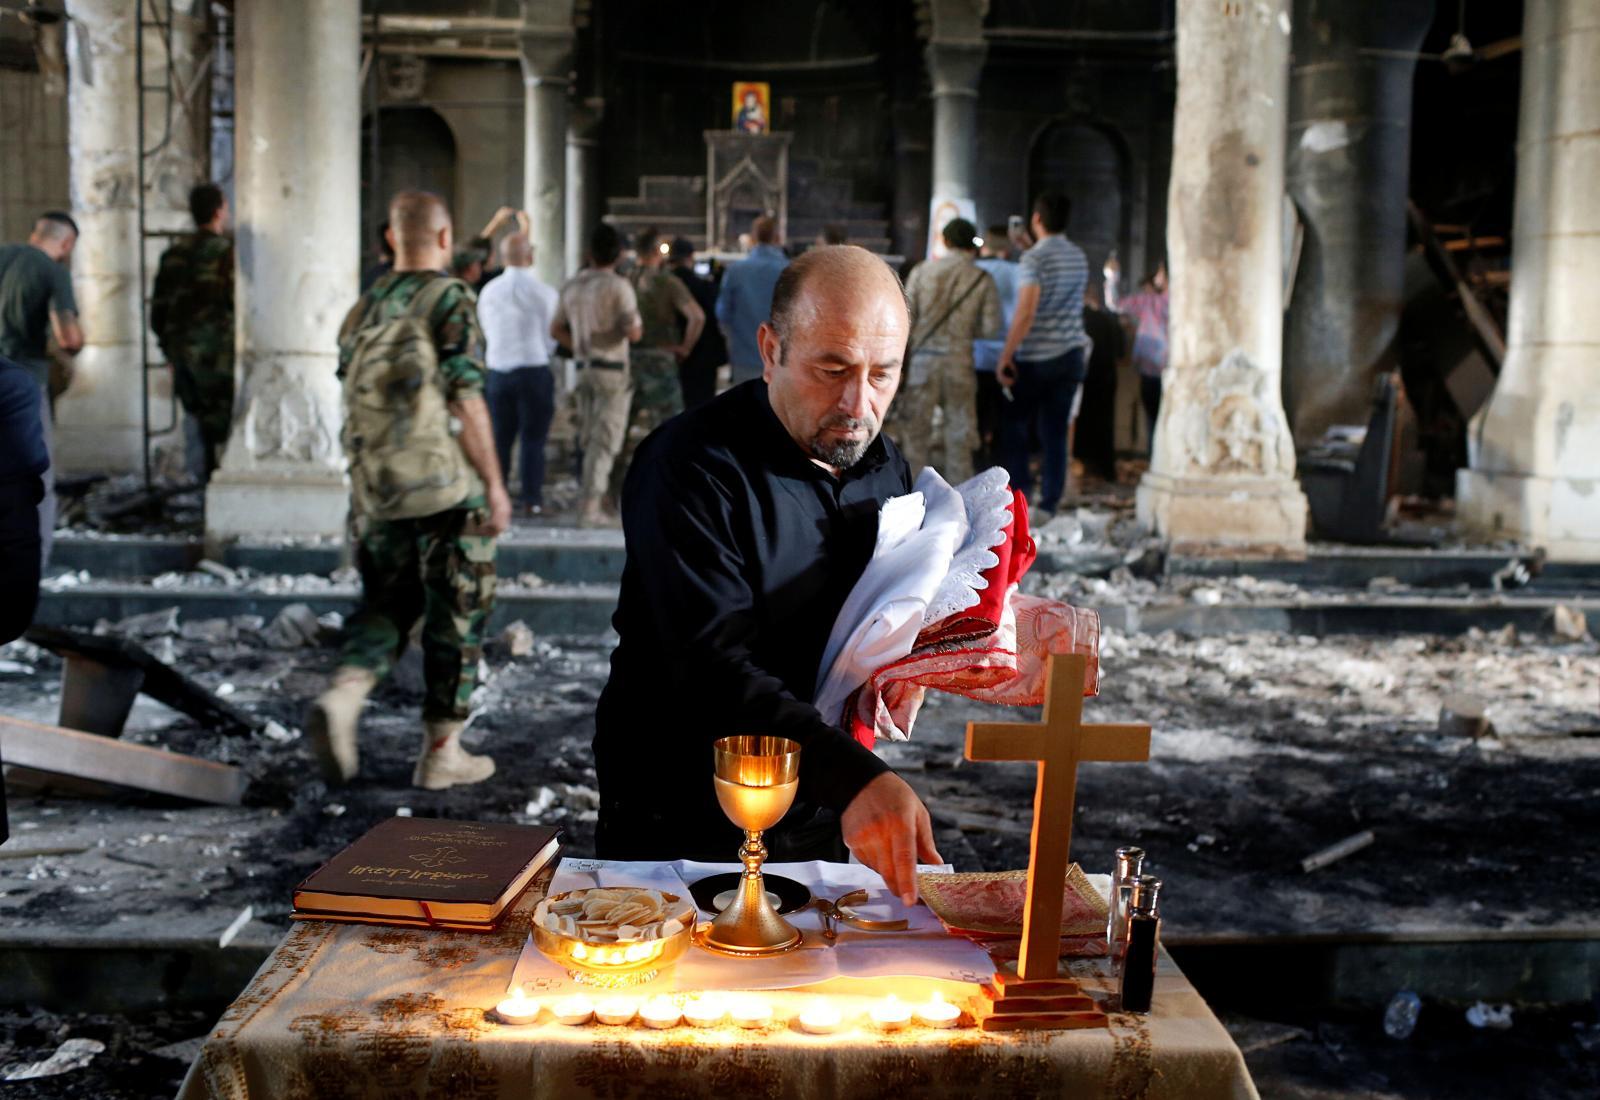 Доклад «Kirche in Not»: гонения на христиан достигли беспрецедентного уровня